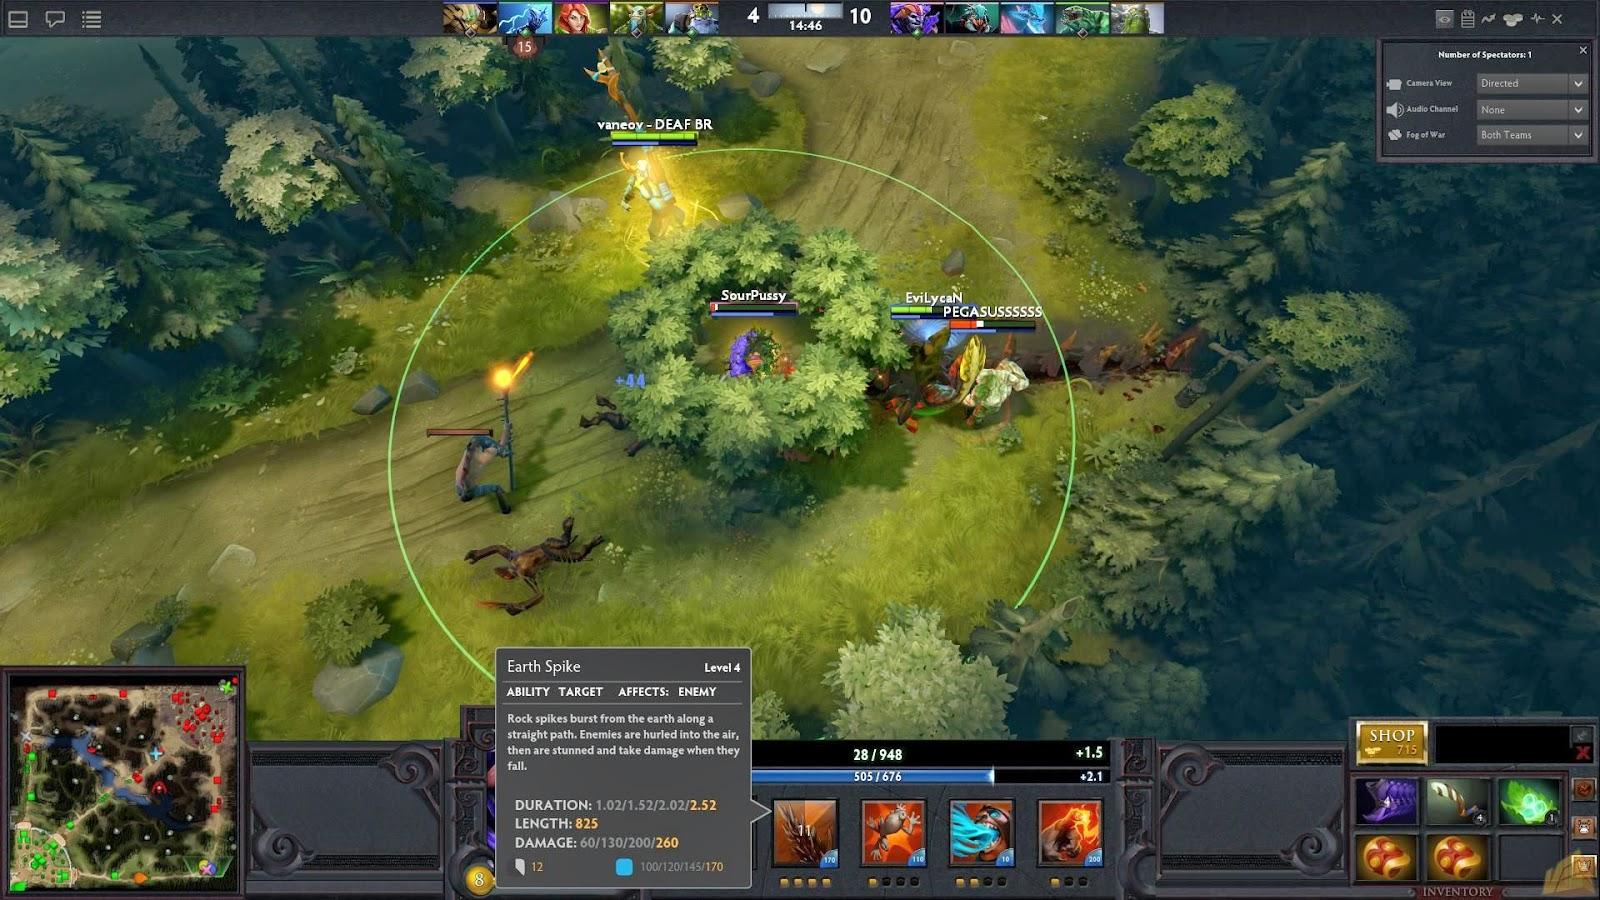 Download DOTA 2 (Guide) ~ Techno Gaming